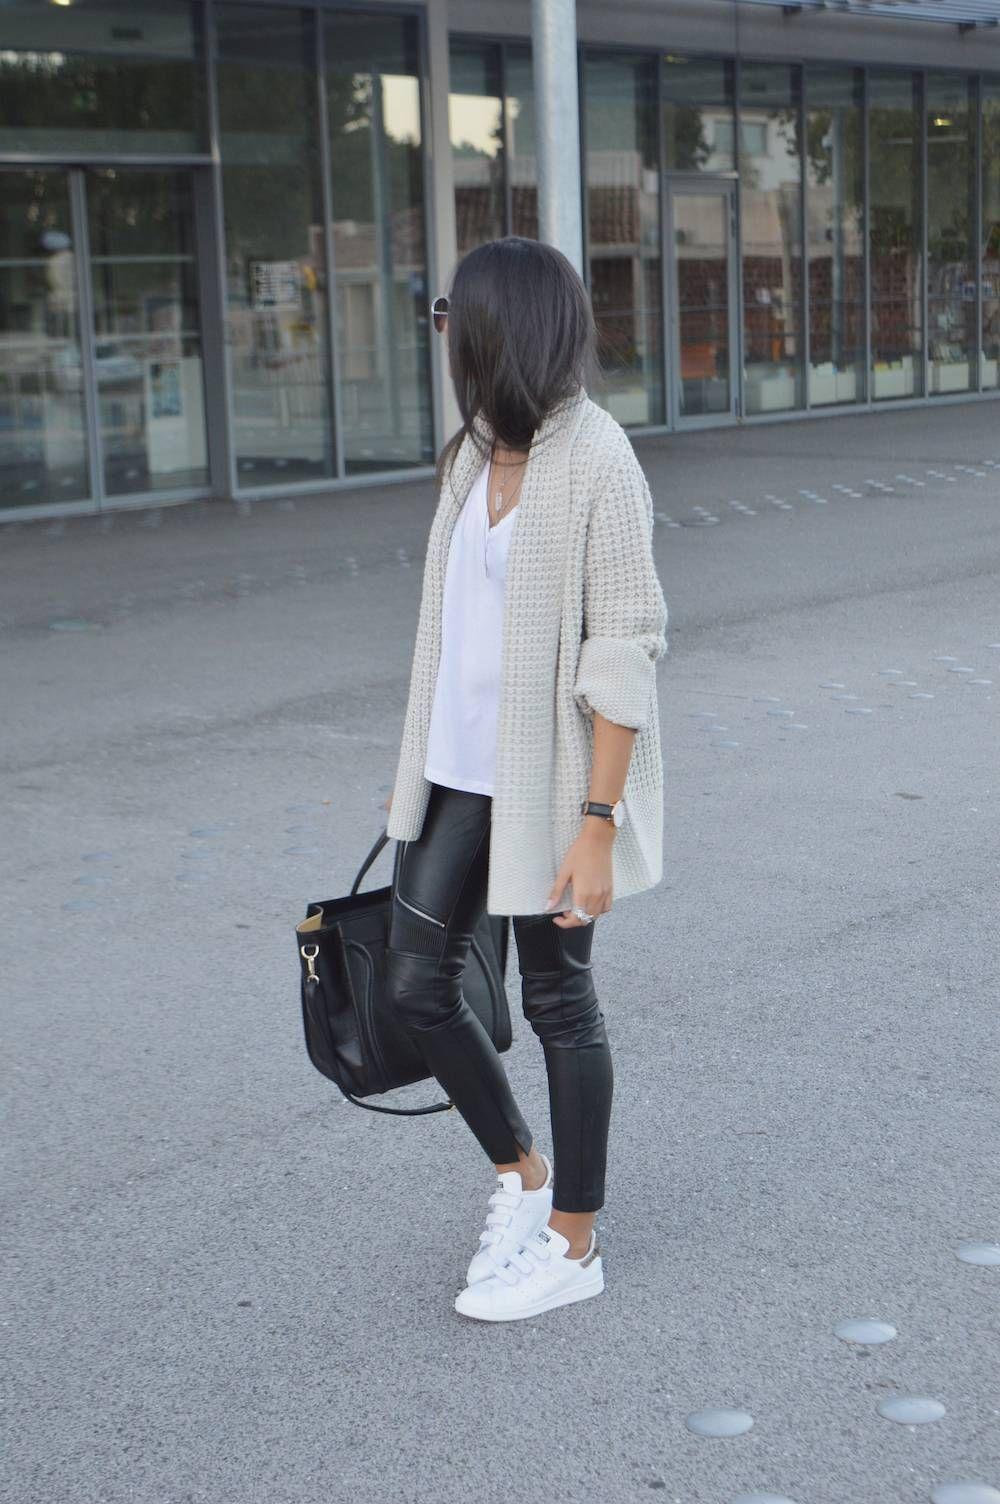 Blog mode id e tenue froid hiver pinterest idee tenue froid et tenues - Idee tenue hiver ...